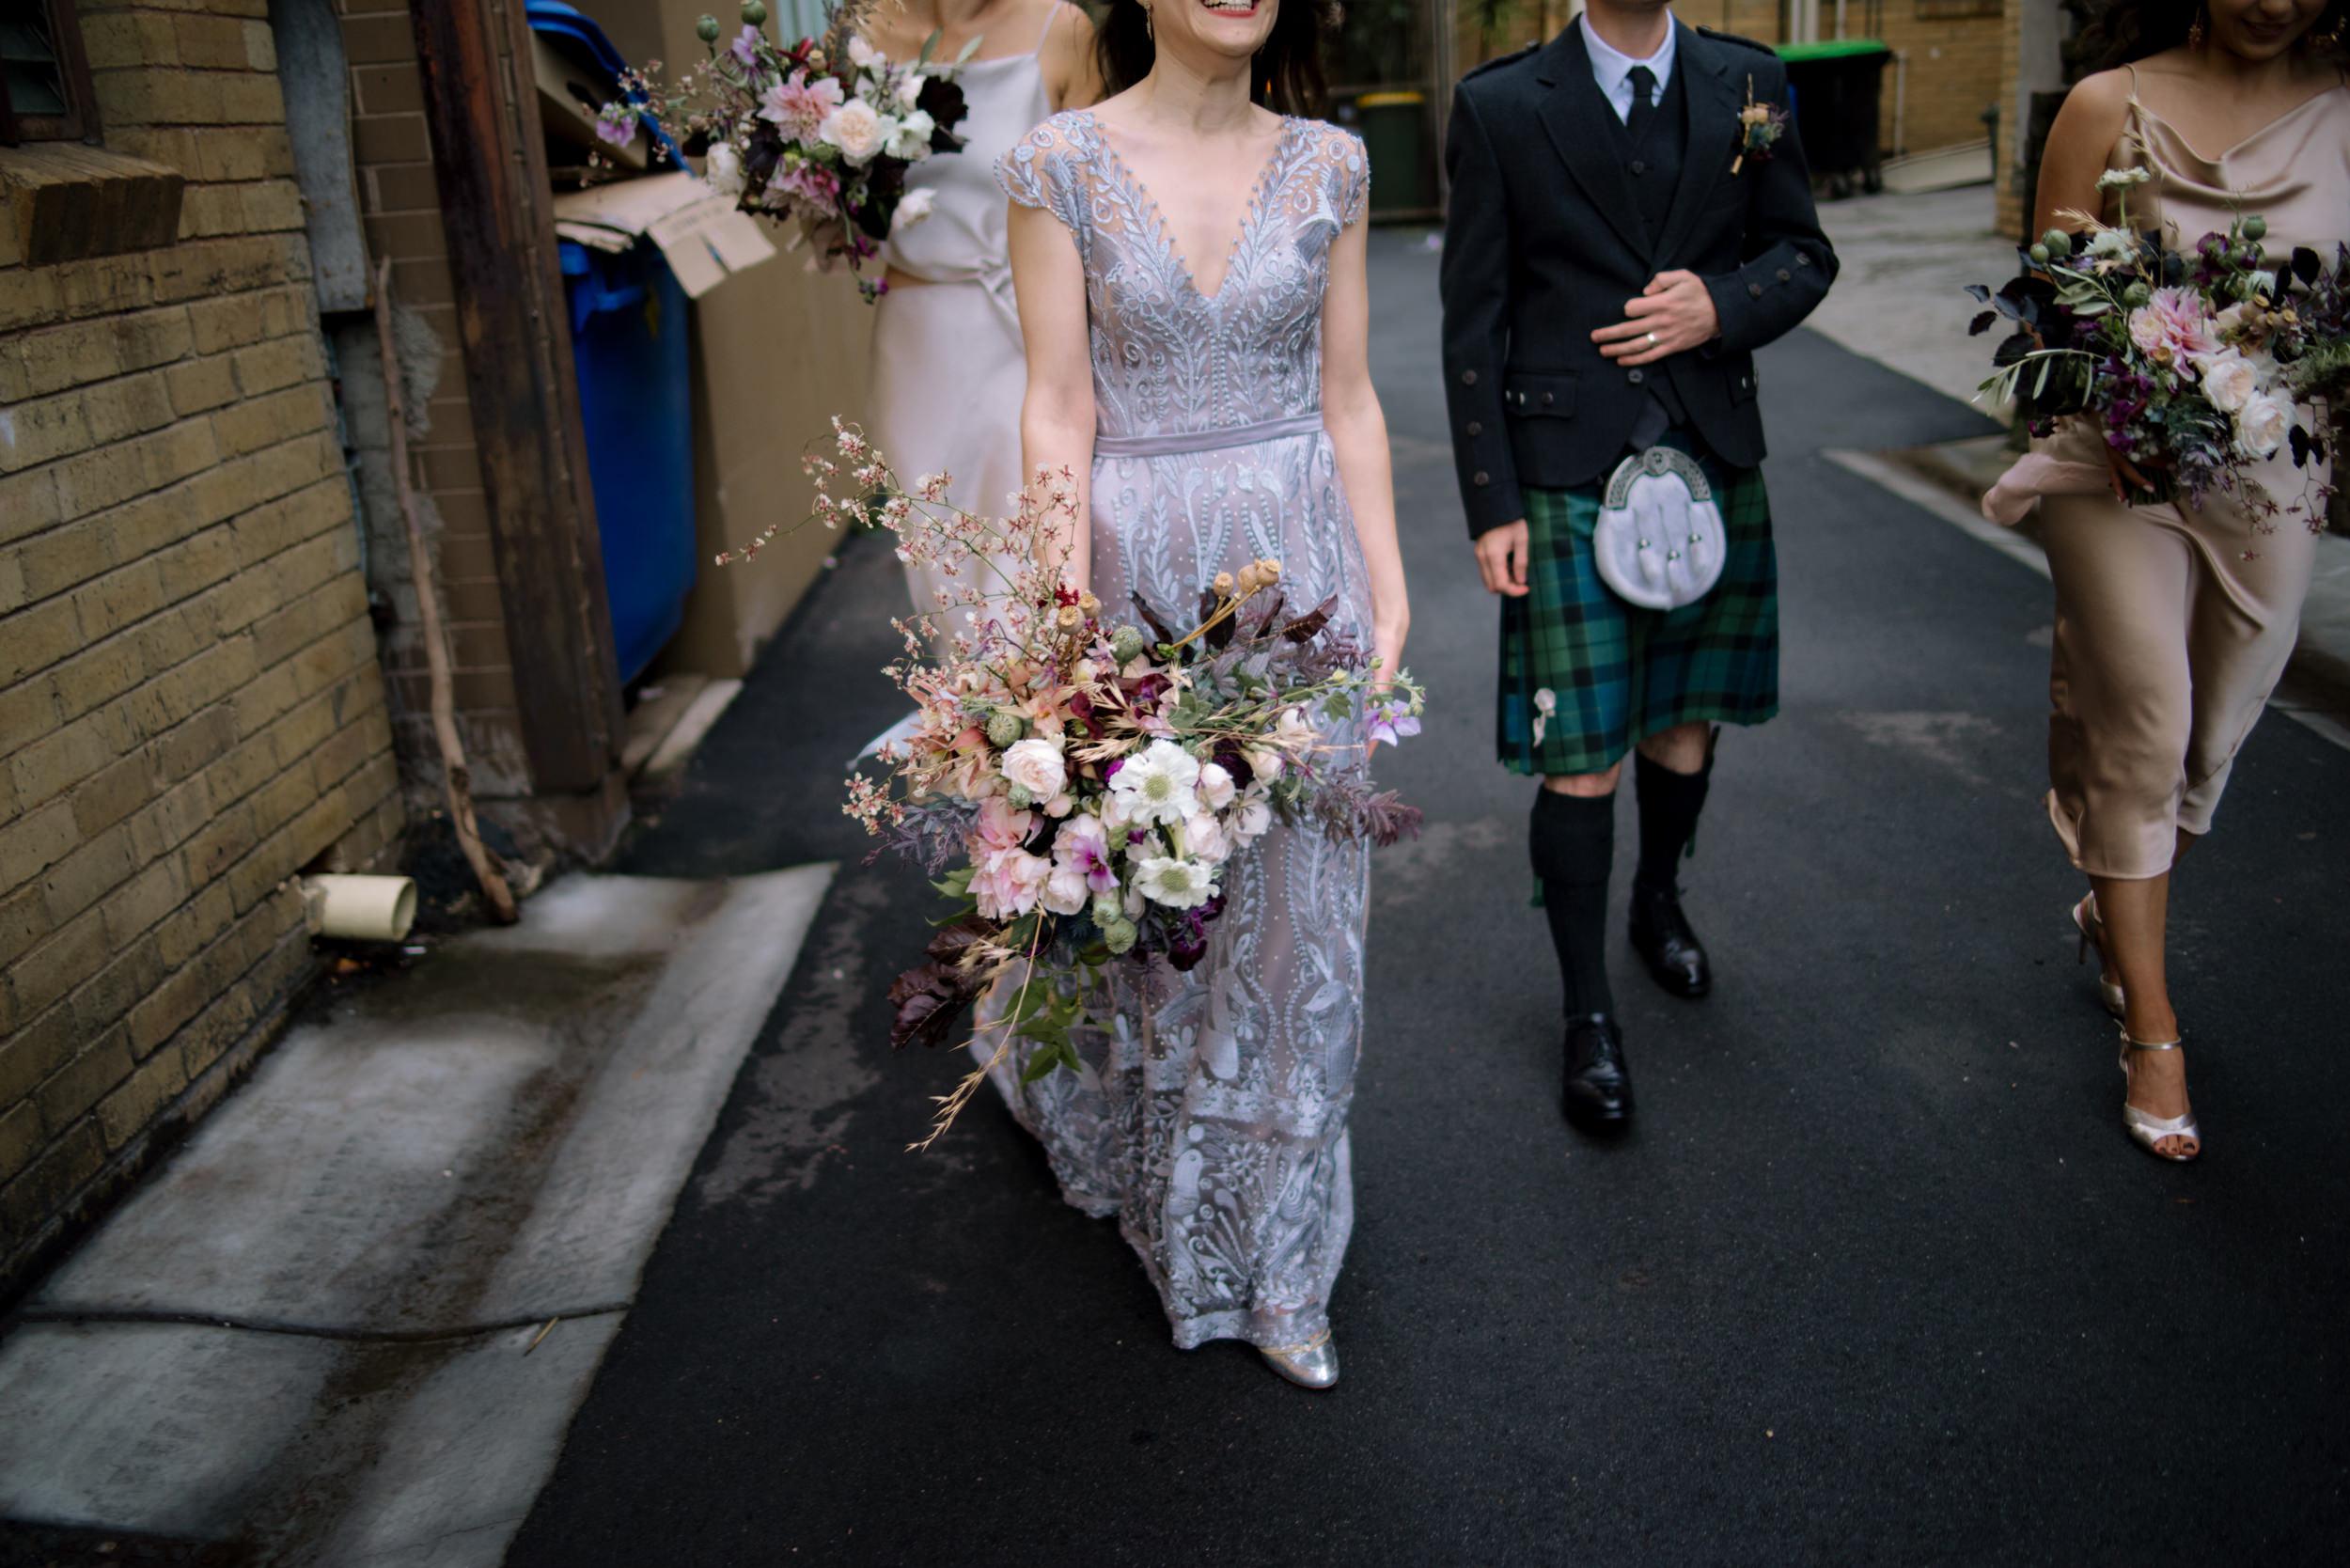 I-Got-You-Babe-&.Co.-Glasshaus-Wedding-Charlotte-Cameron0097.JPG